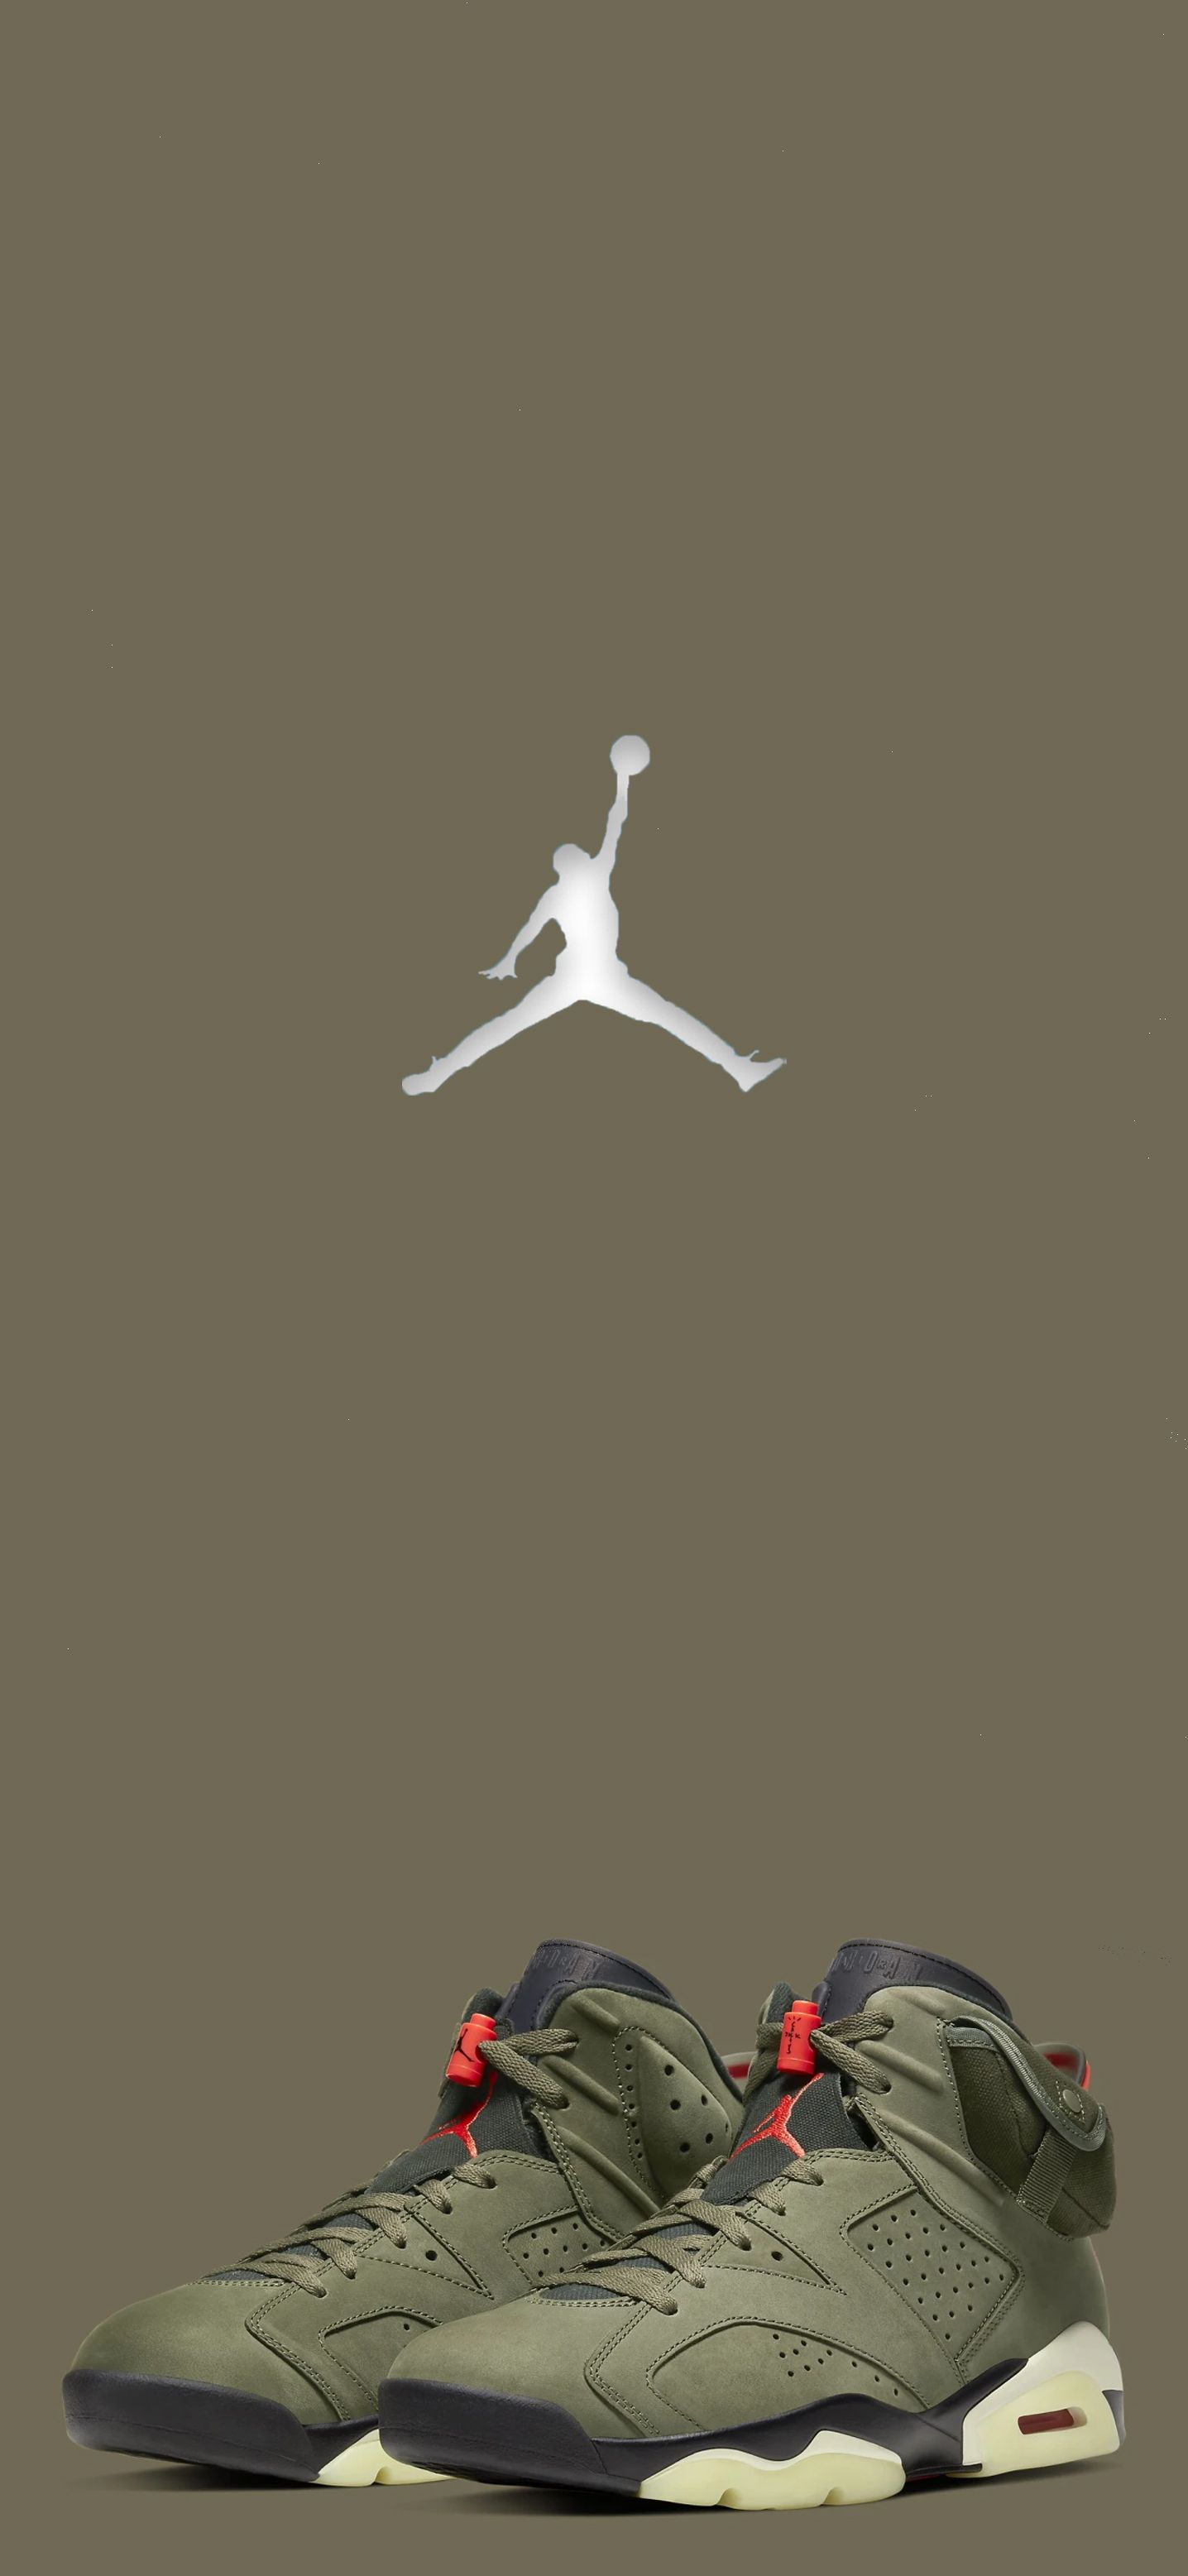 Air Jordan 6 S Sp Travis Scott In 2020 Travis Scott Wallpapers Hypebeast Wallpaper Jordan 6